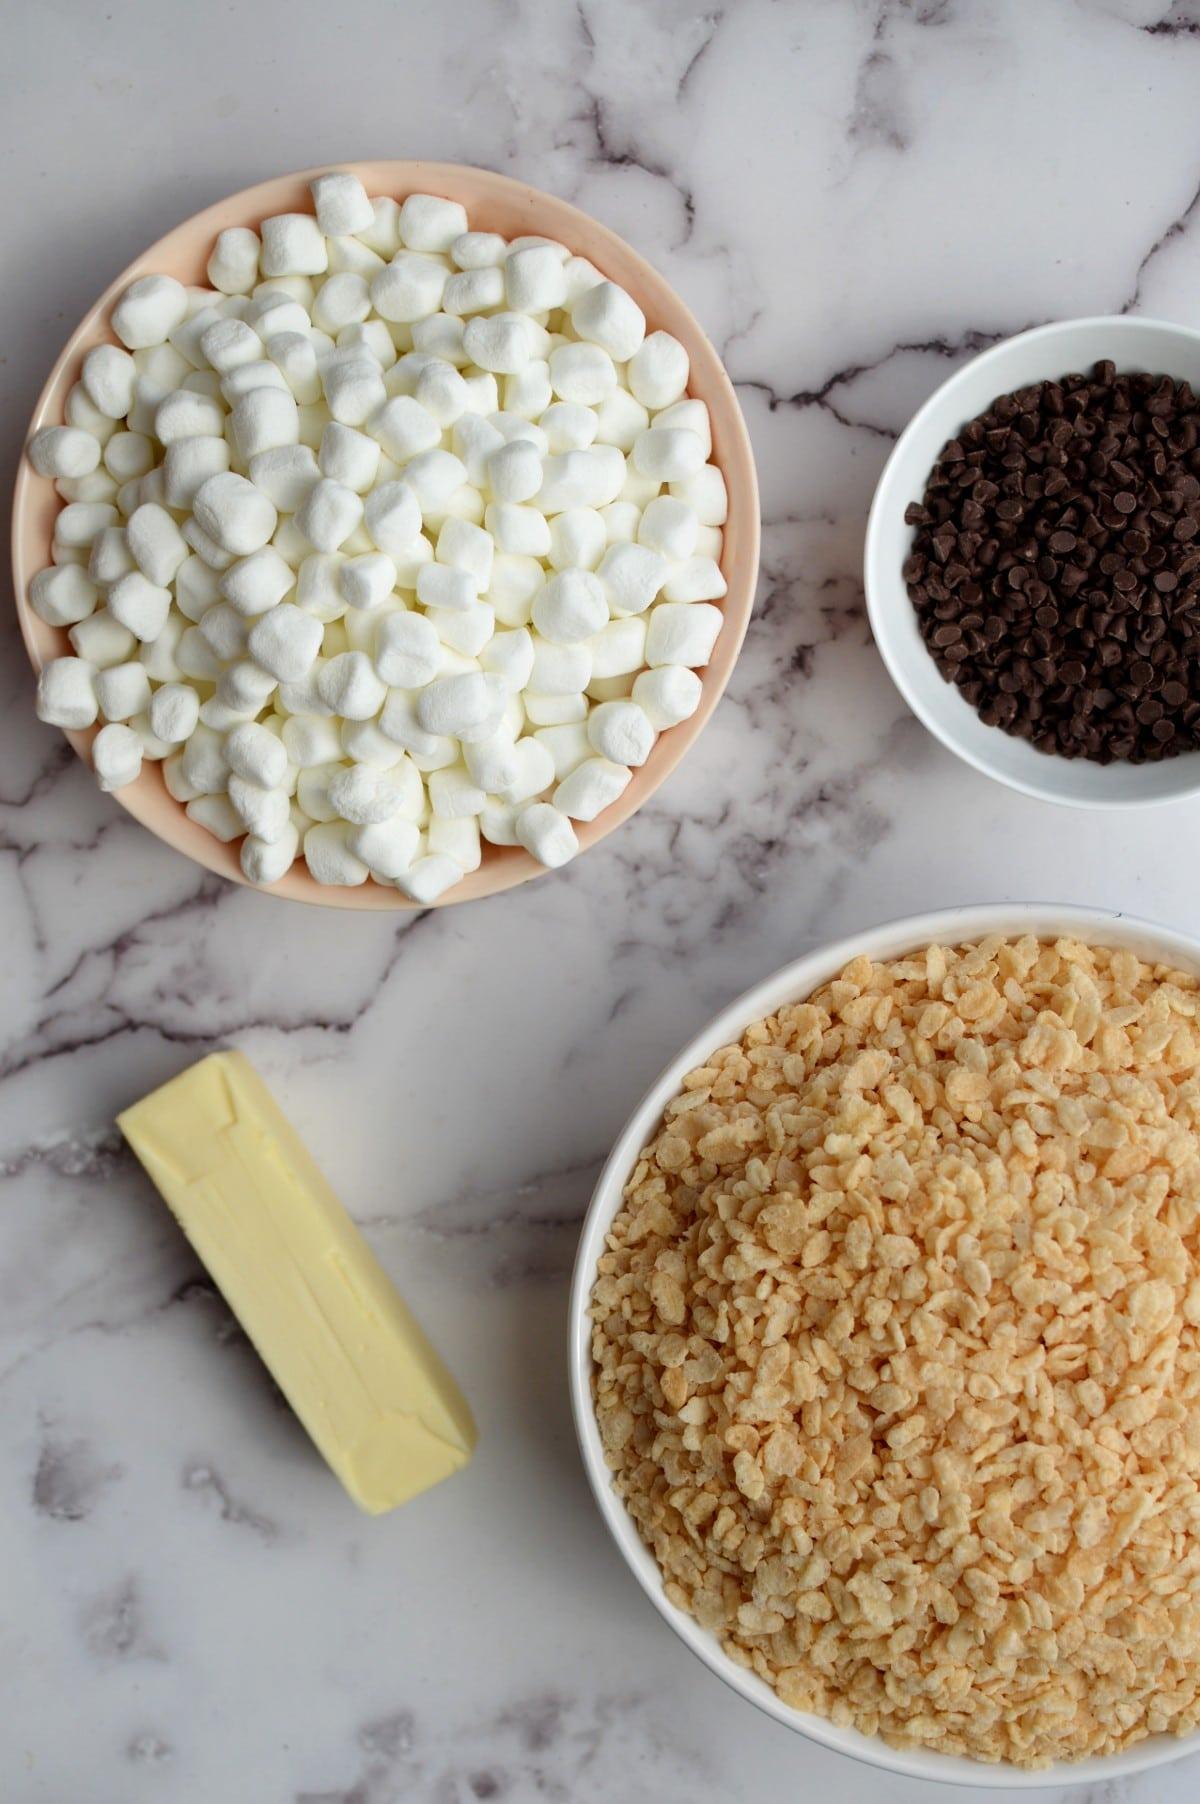 Ingredients for choc chip rice krispie treats